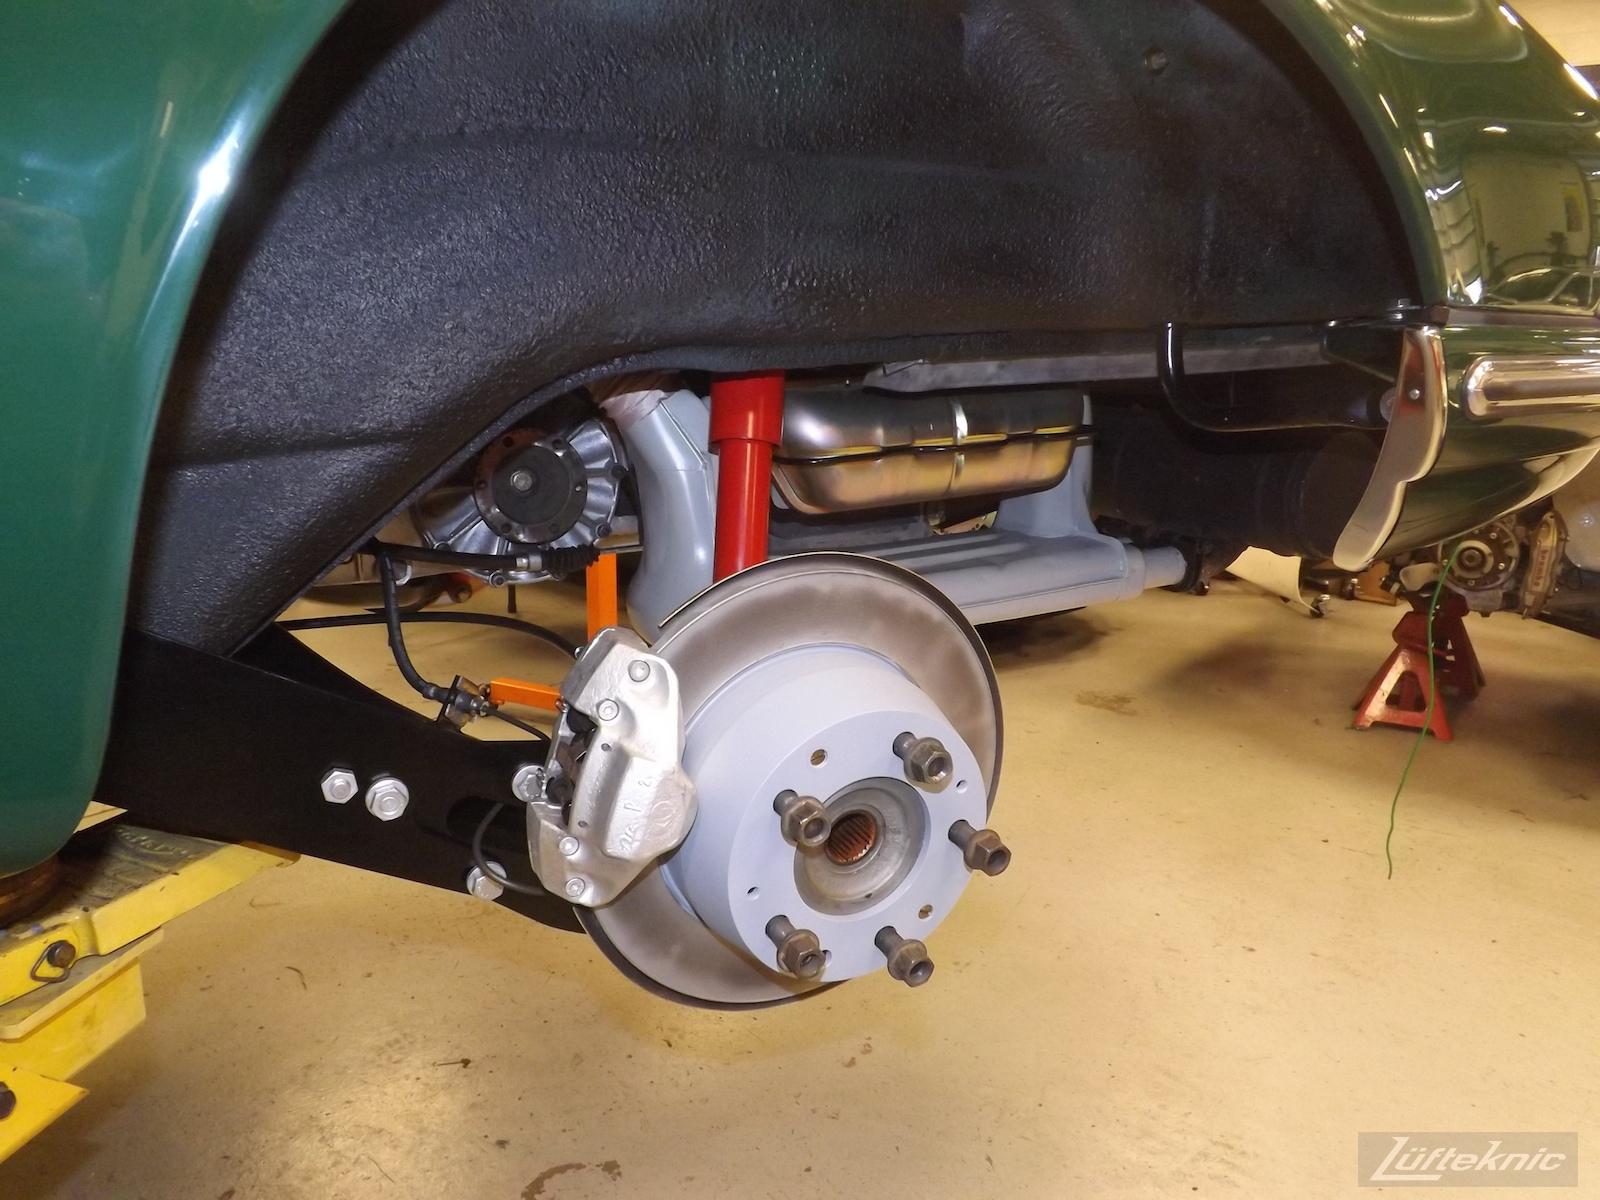 Finished brakes on an Irish Green Porsche 912 undergoing restoration at Lufteknic.